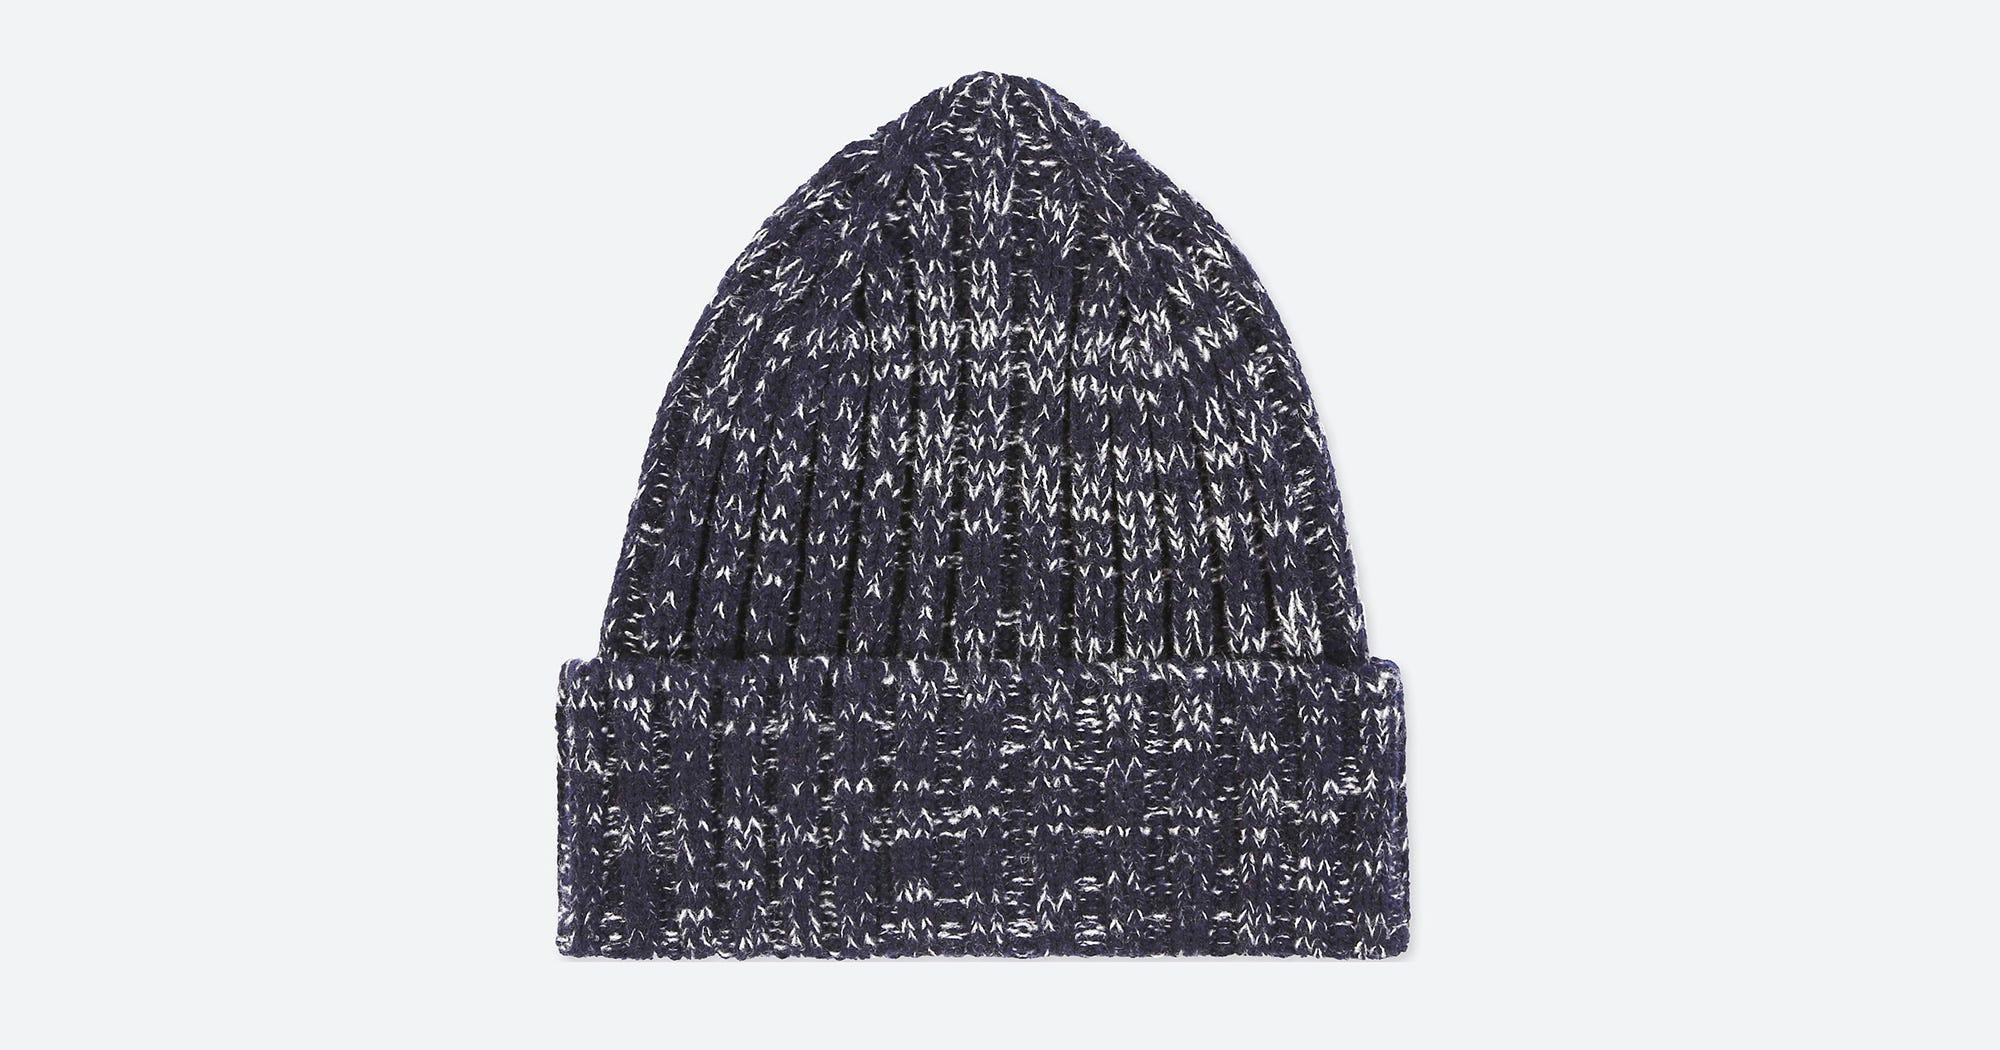 uniqlo winter essentials best puffer jacket turtleneck. Black Bedroom Furniture Sets. Home Design Ideas